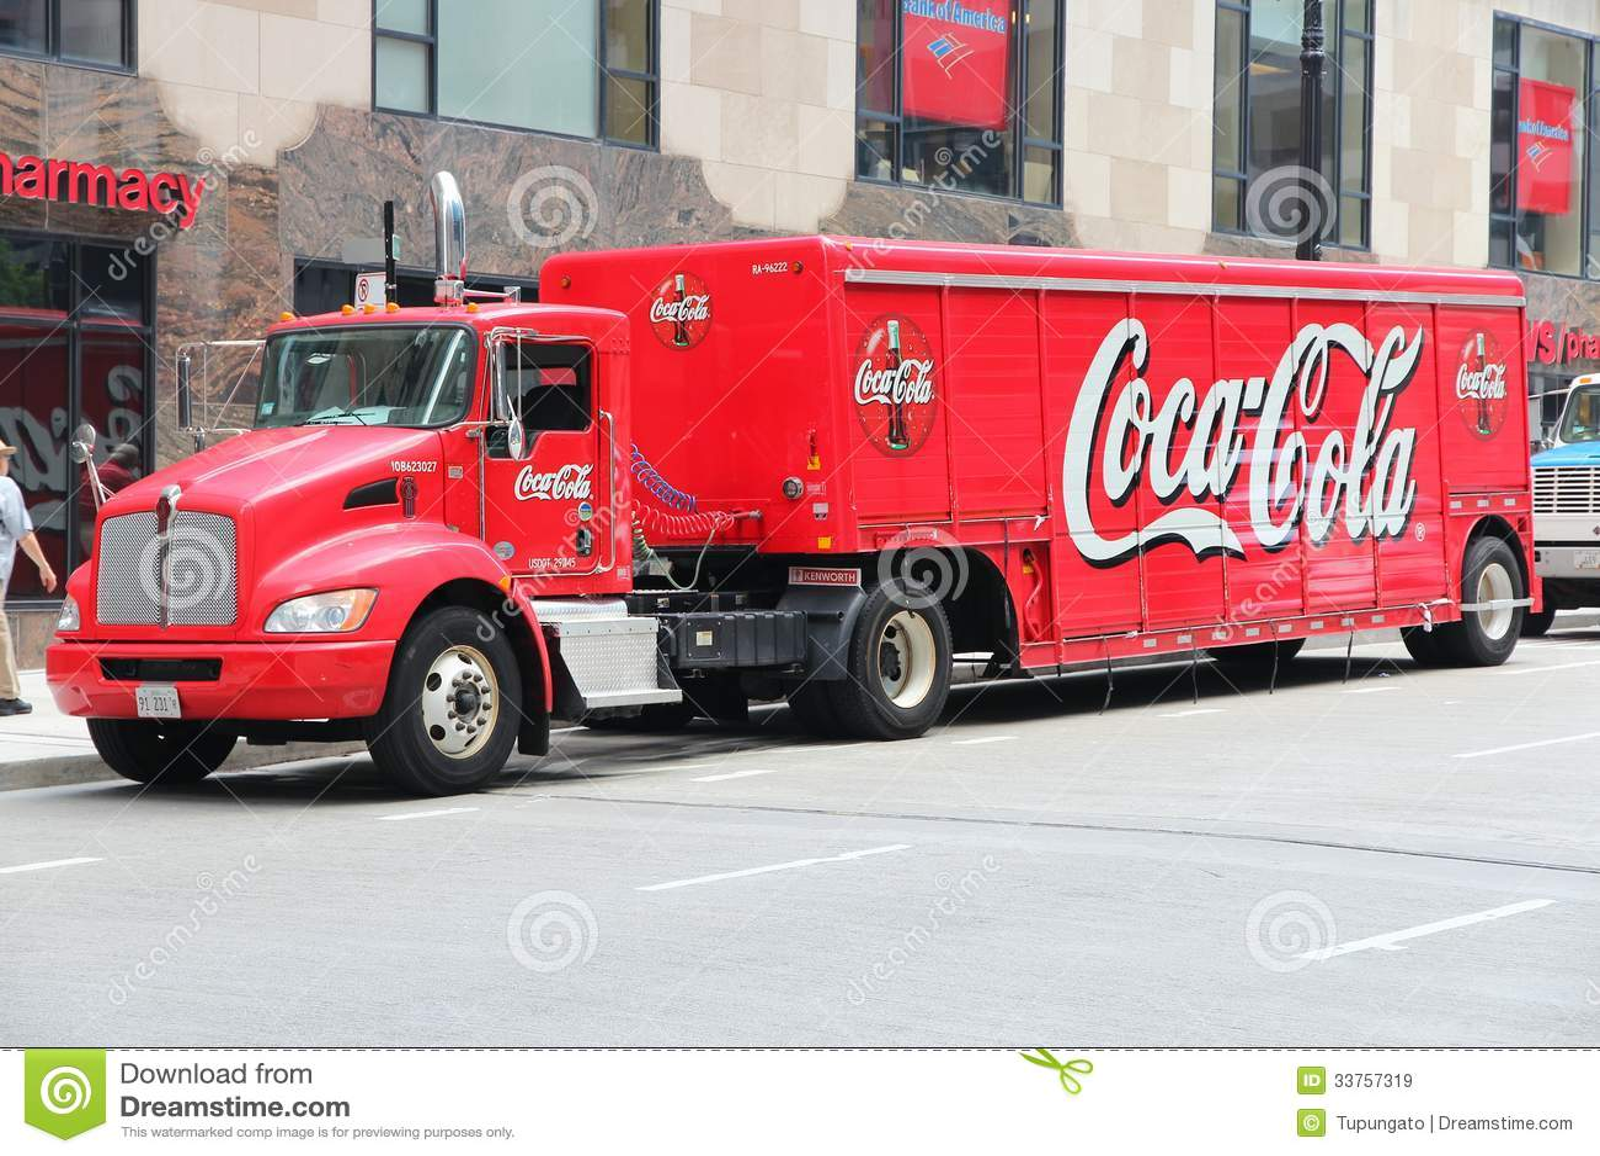 Coca Cola truck editorial stock image. Image of ...